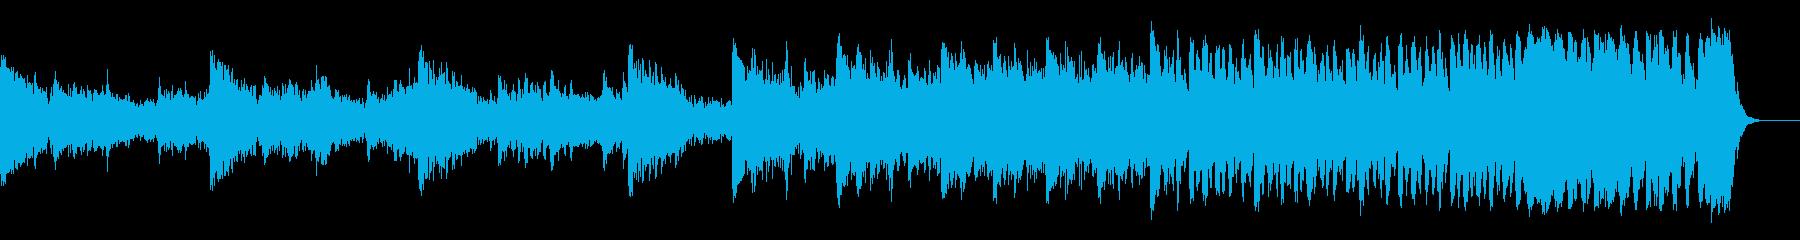 Alt Mix Menacing、...の再生済みの波形